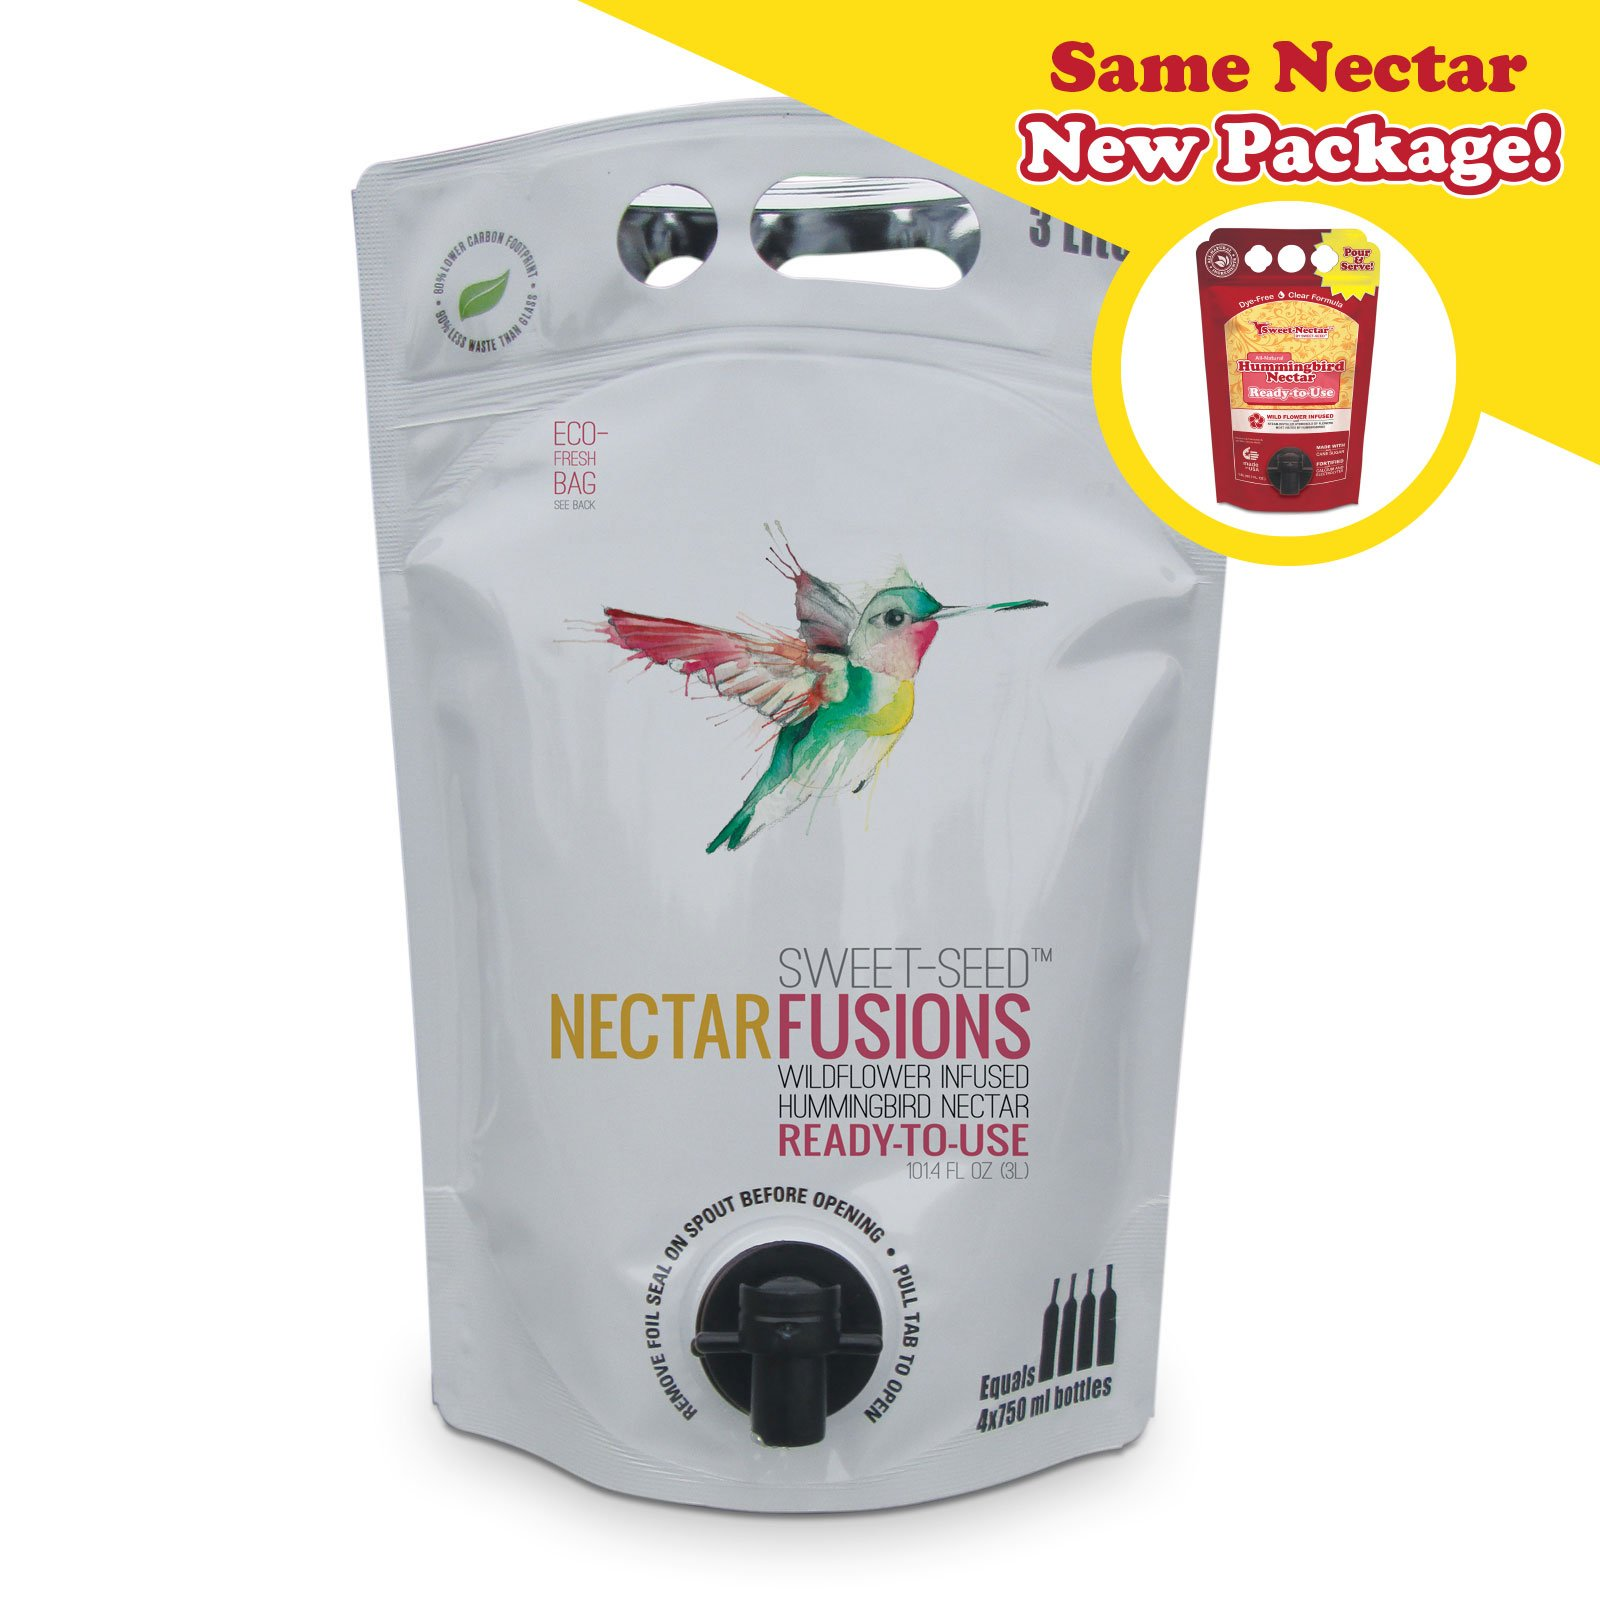 Sweet-Seed, LLC Nectar Fusions Hummingbird Food: All-natural & Dye Free, Wildflower Infused Hummingbird Nectar (100 oz. Ready-to-use Formula) by Sweet-Seed, LLC